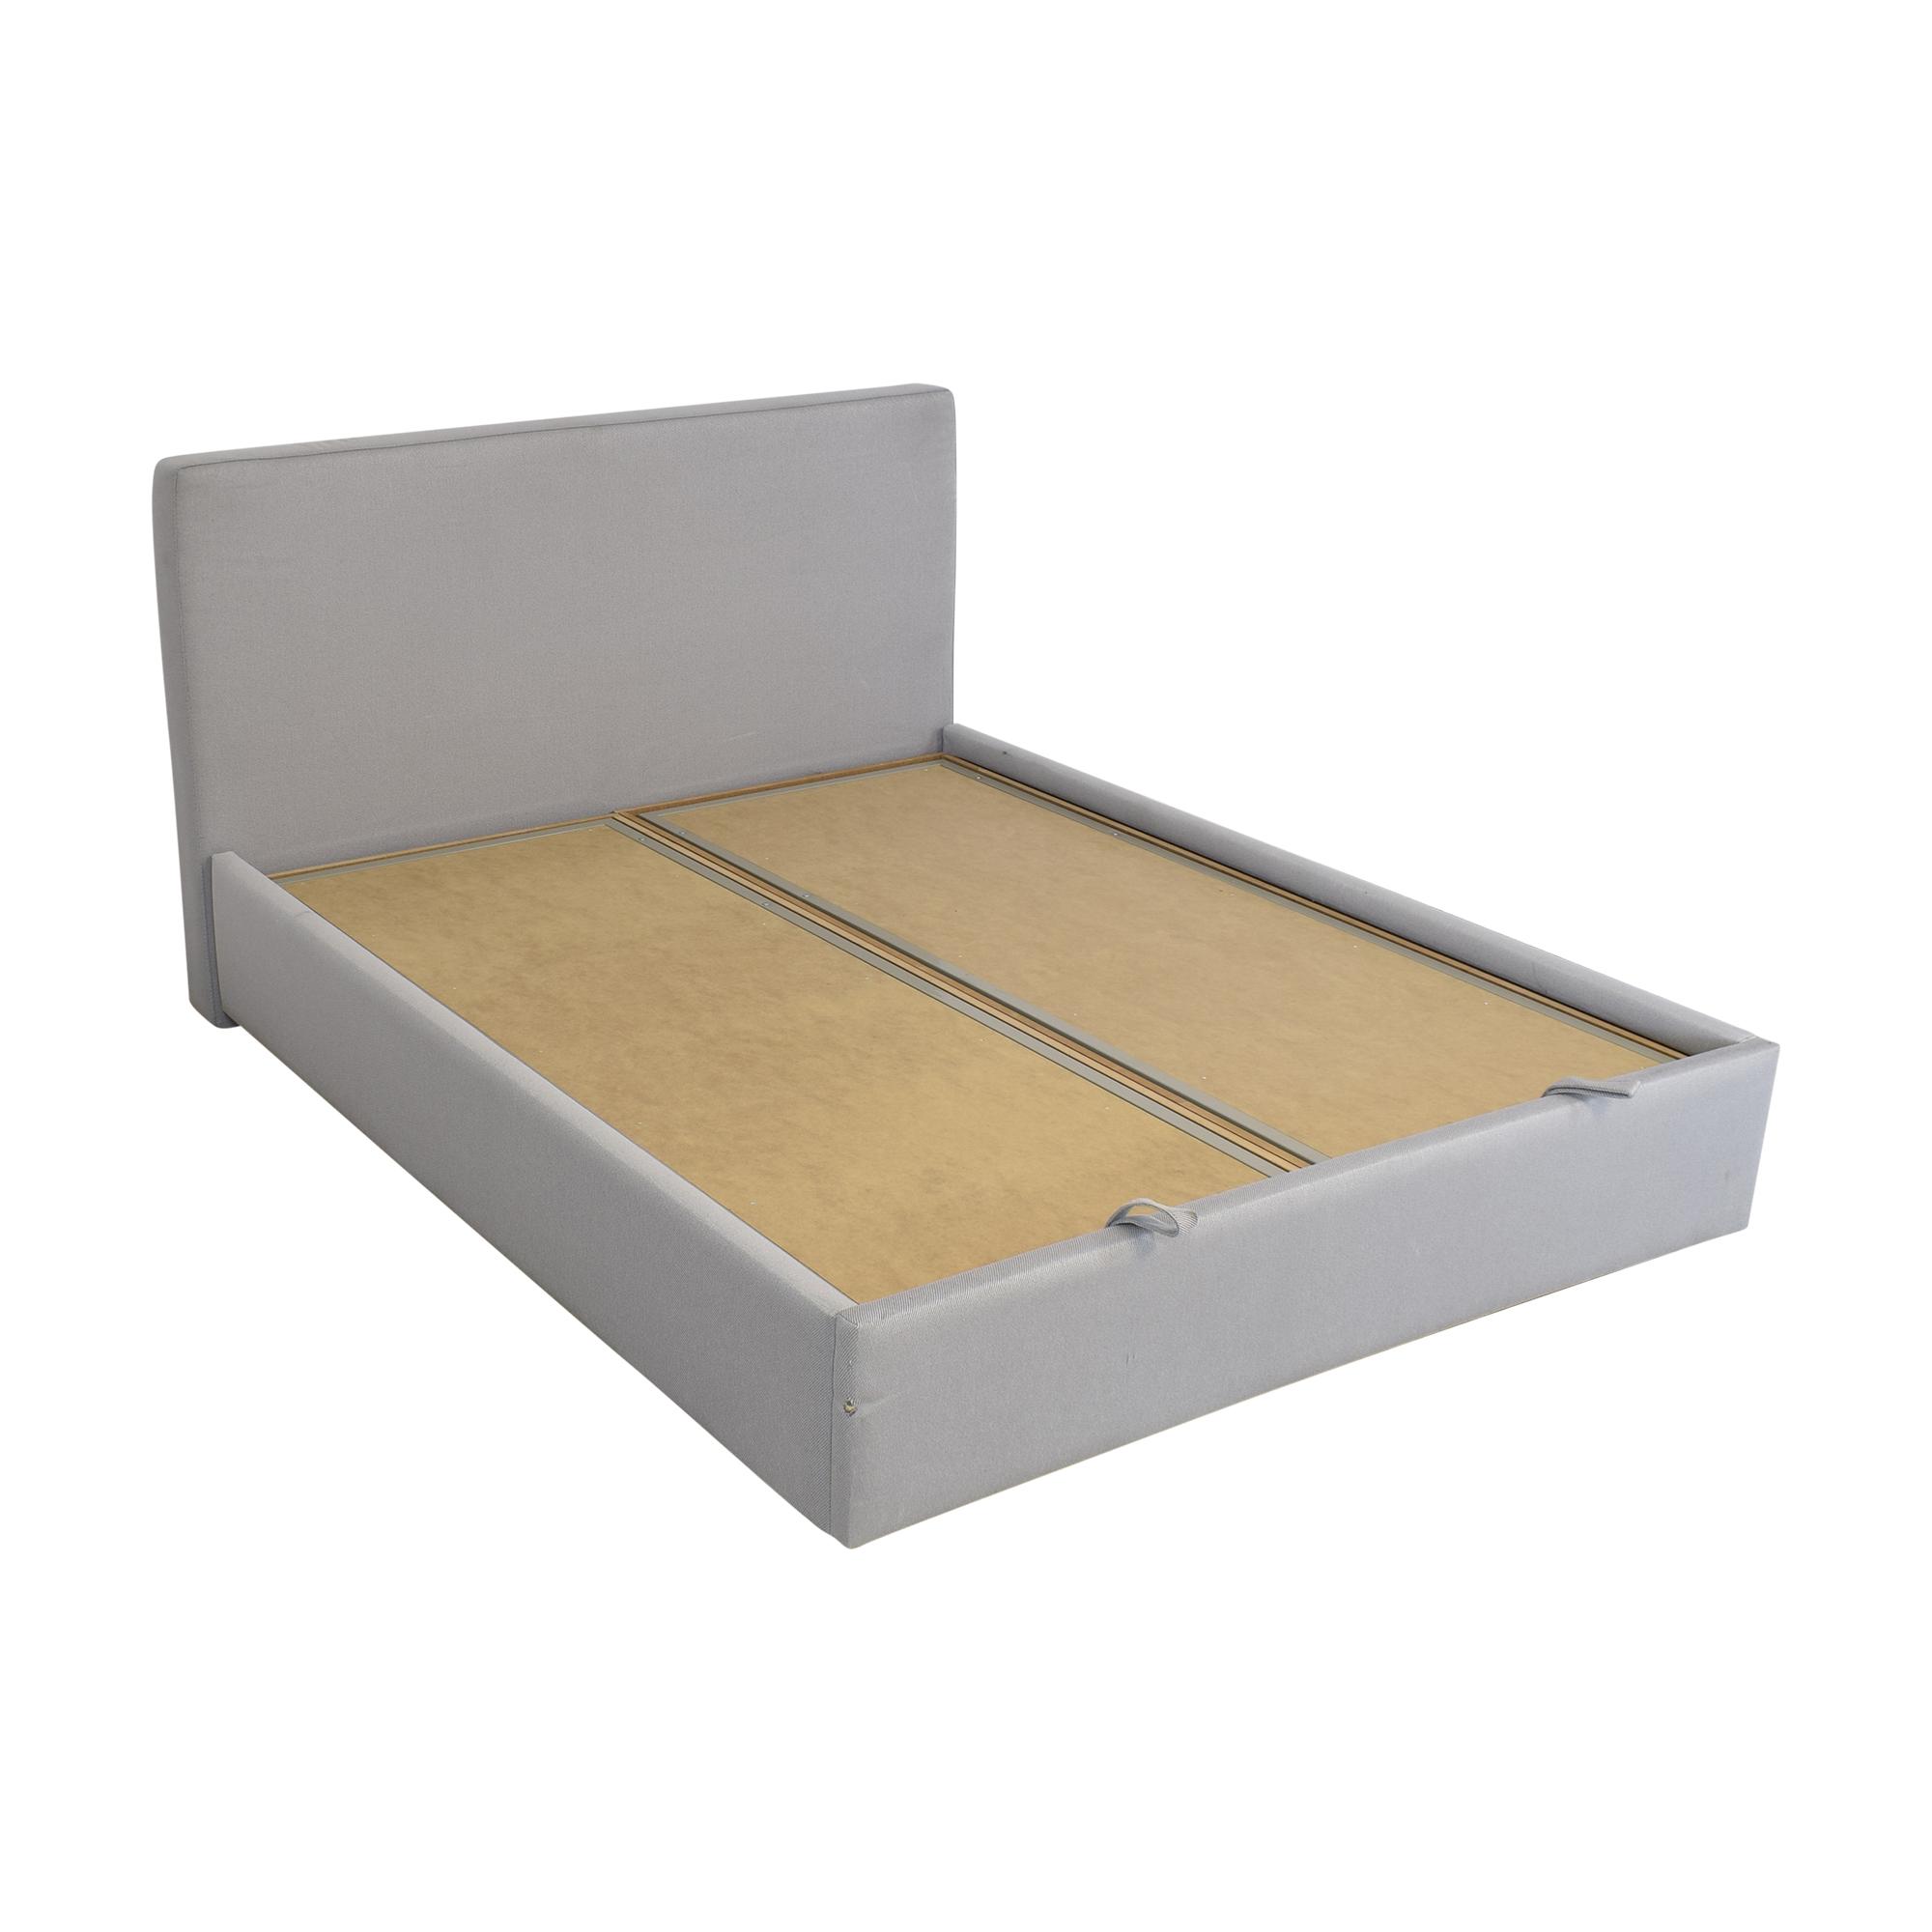 Upholstered Storage Queen Bed / Bed Frames